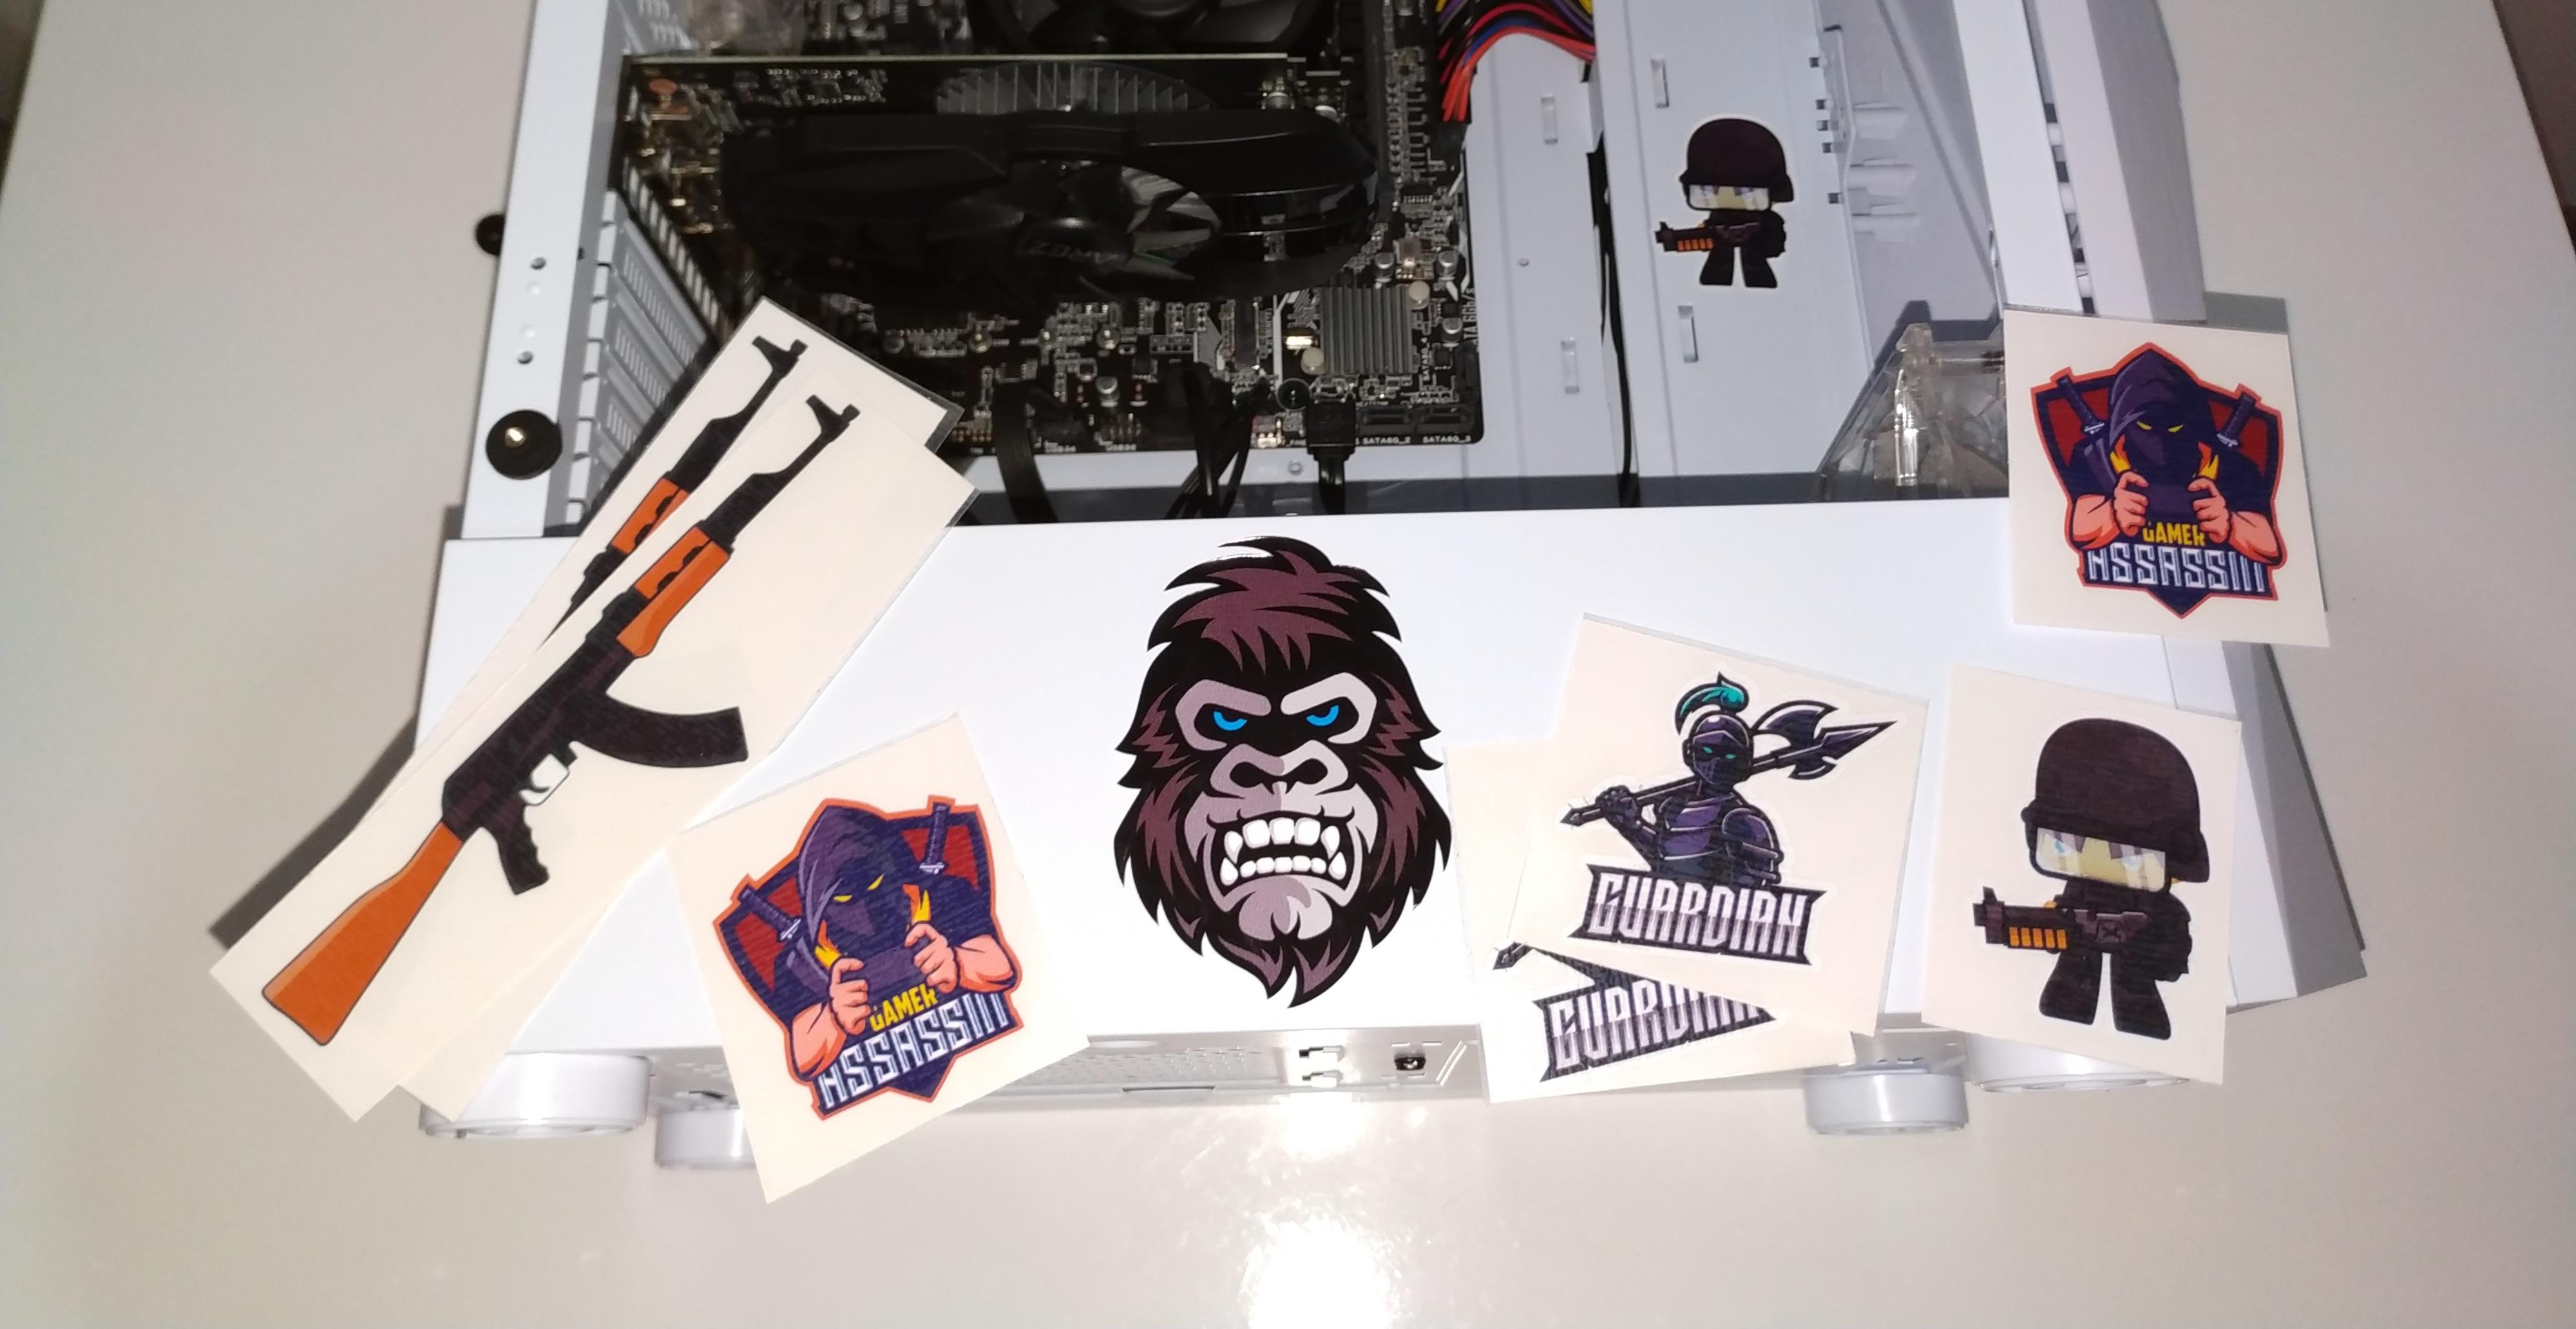 gaming-sticker-onerileri-pc-bilgisayar-modifikasyon-islemleri.jpg